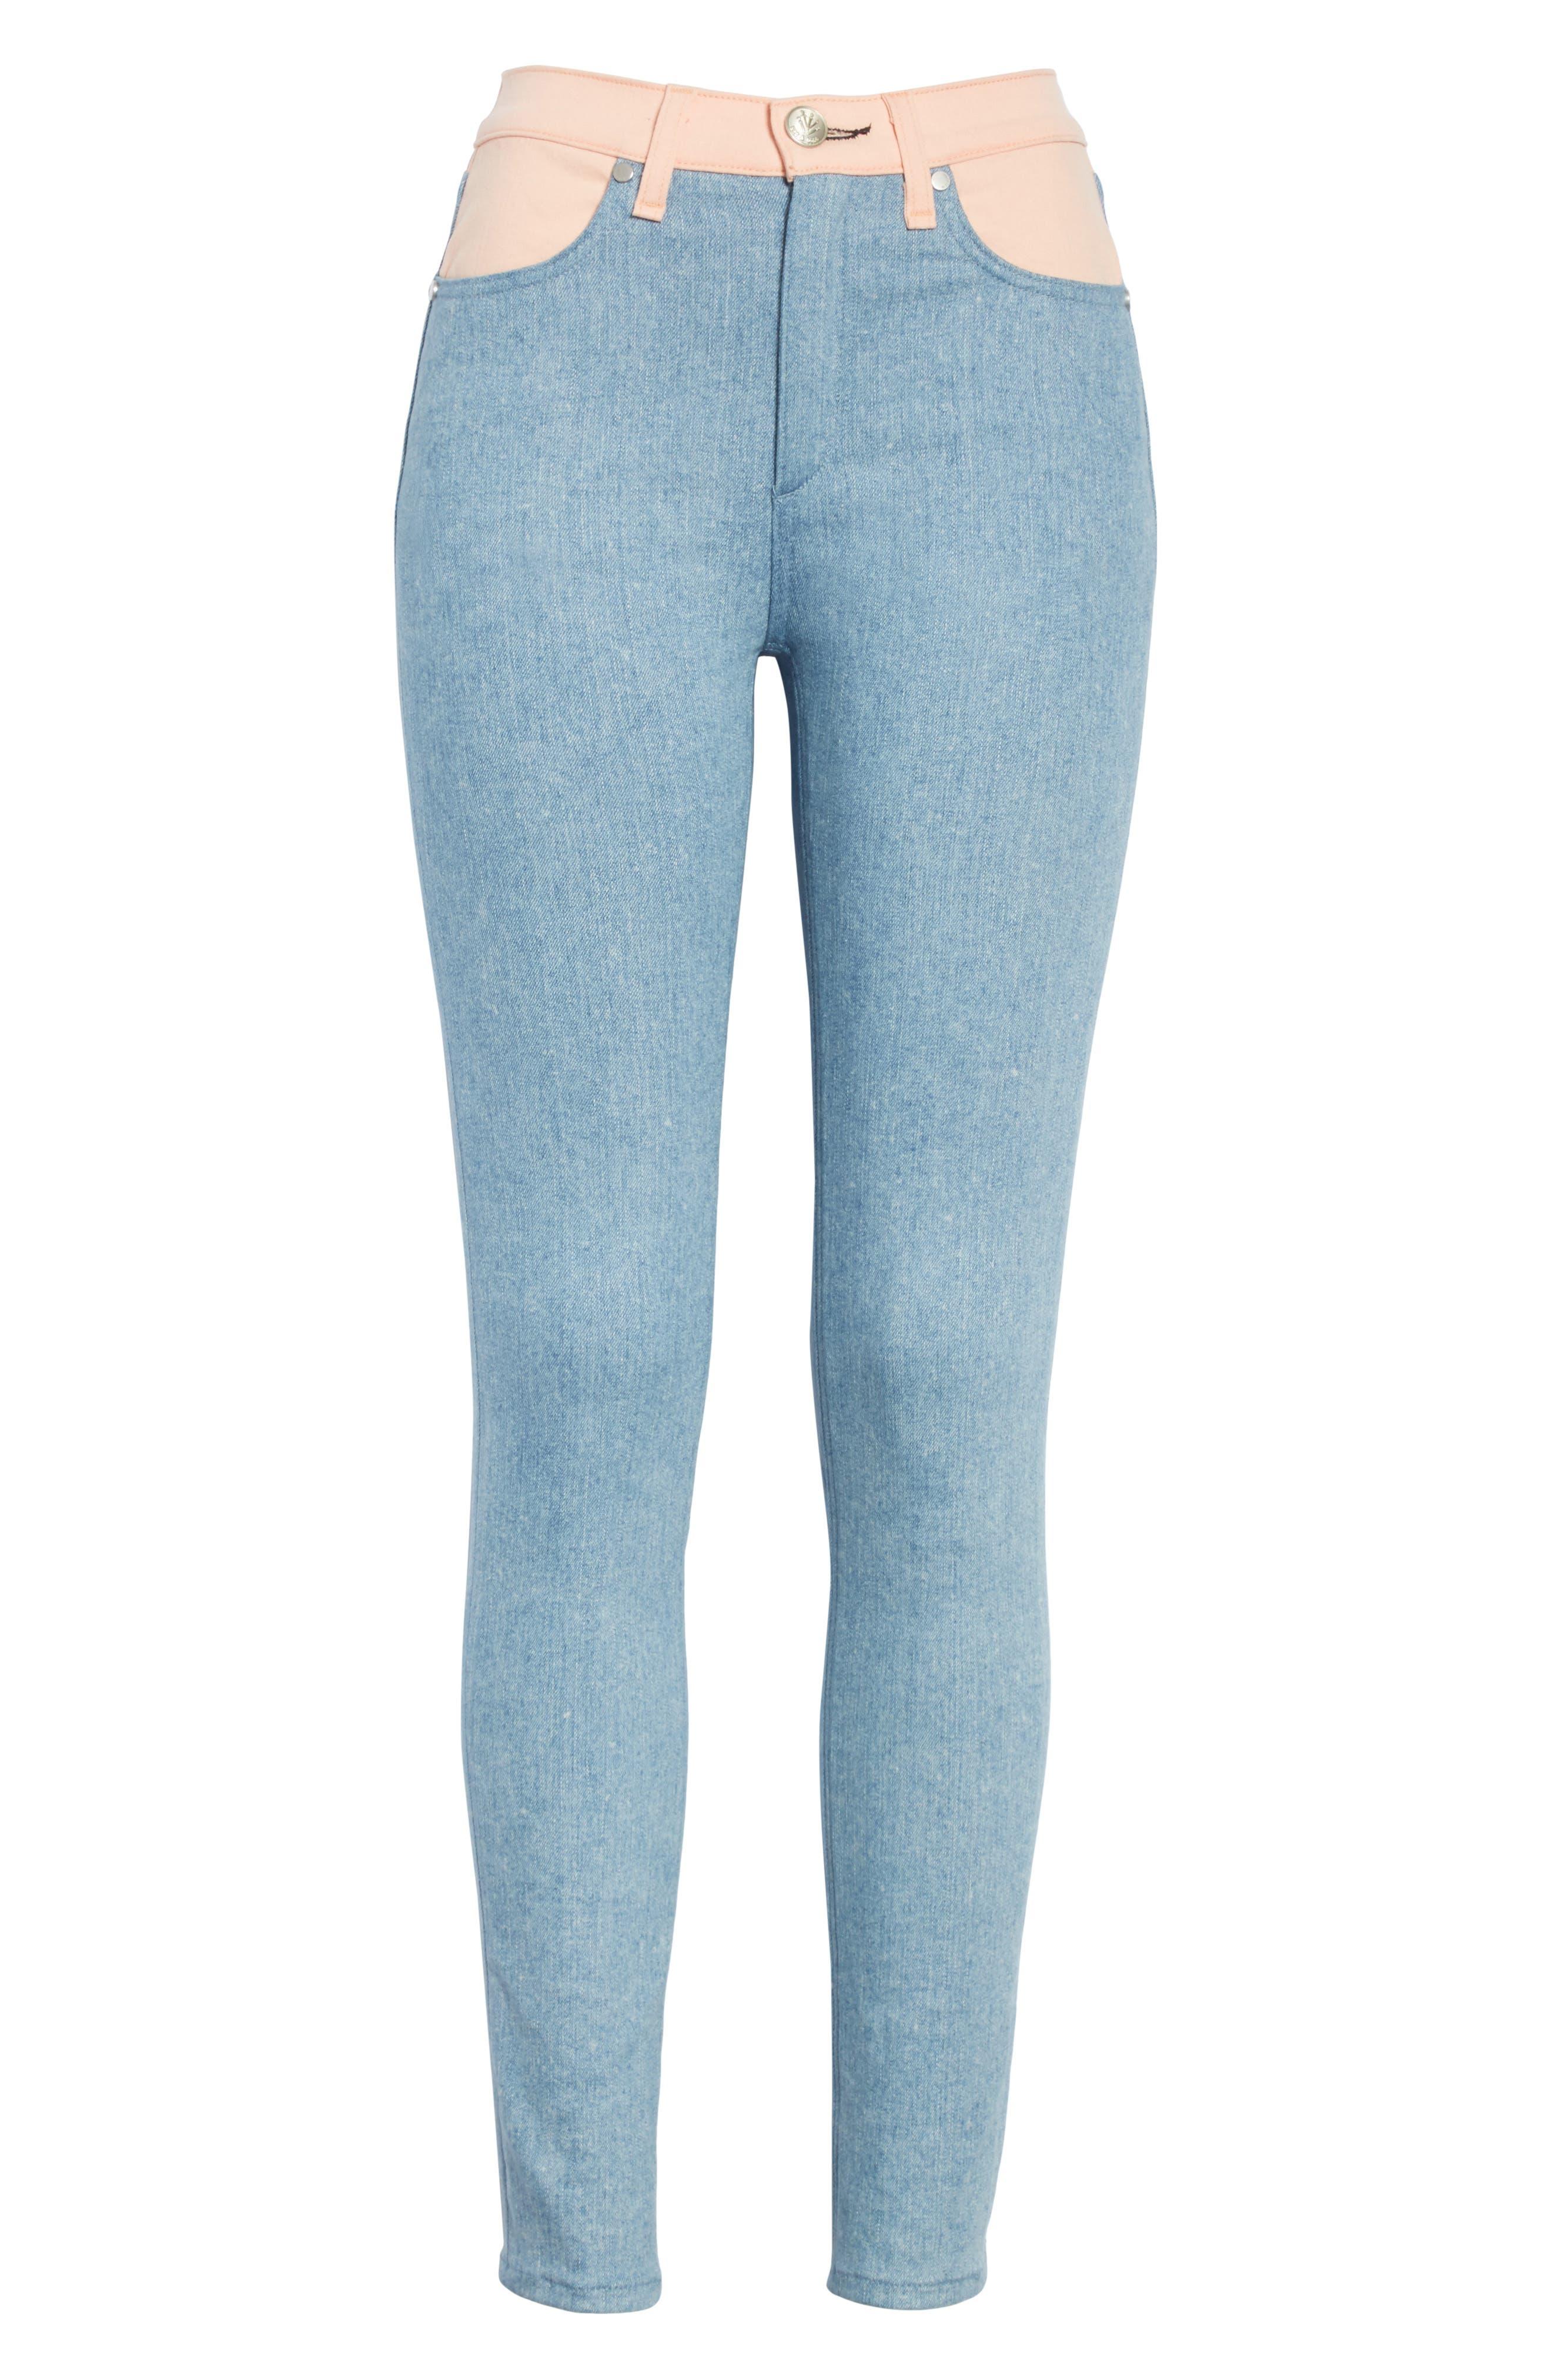 Phila Skinny Jeans,                             Alternate thumbnail 6, color,                             Nelly/ Prairie